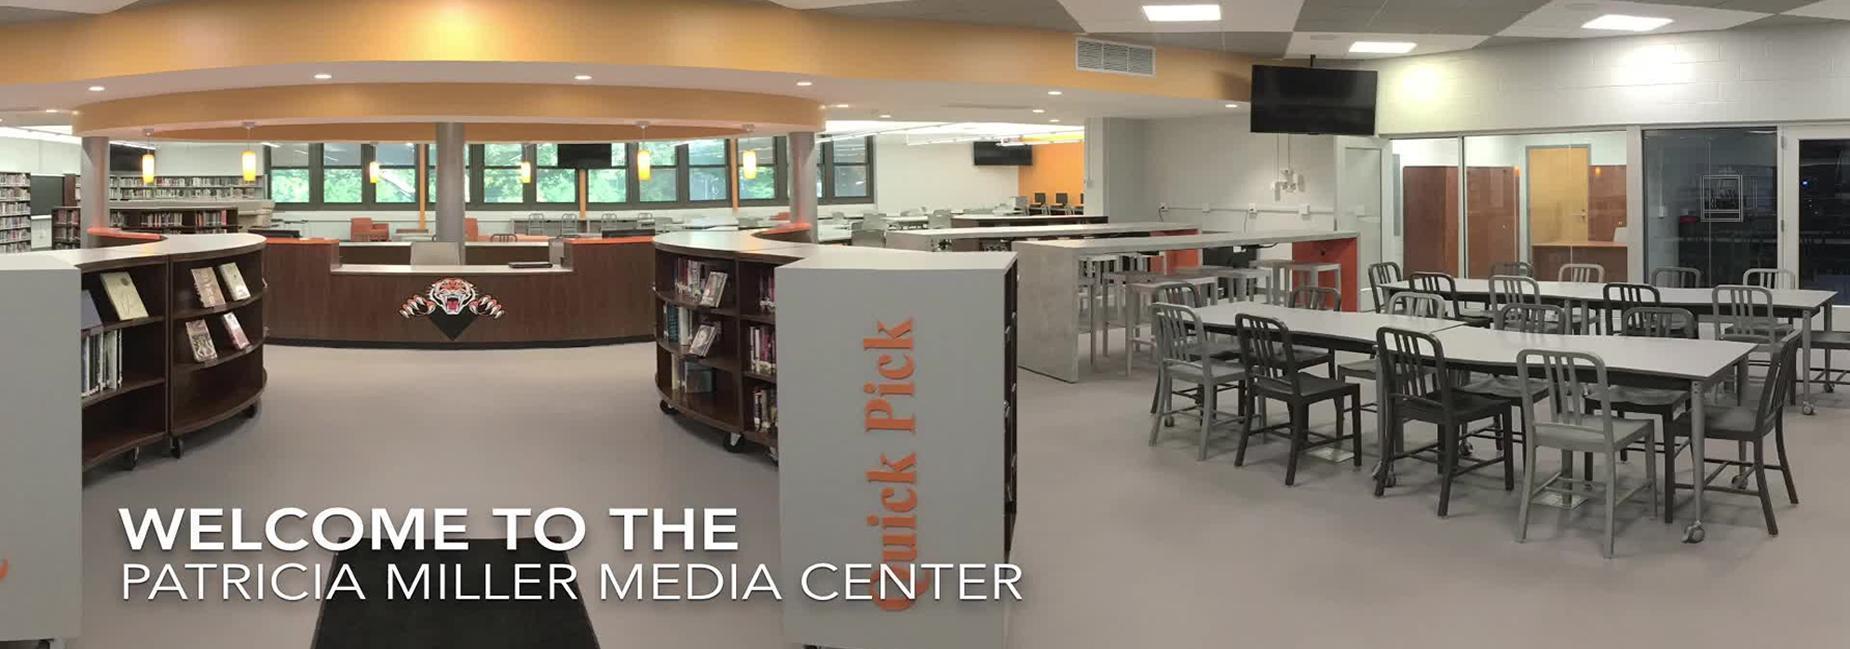 Patricia Miller Media Center